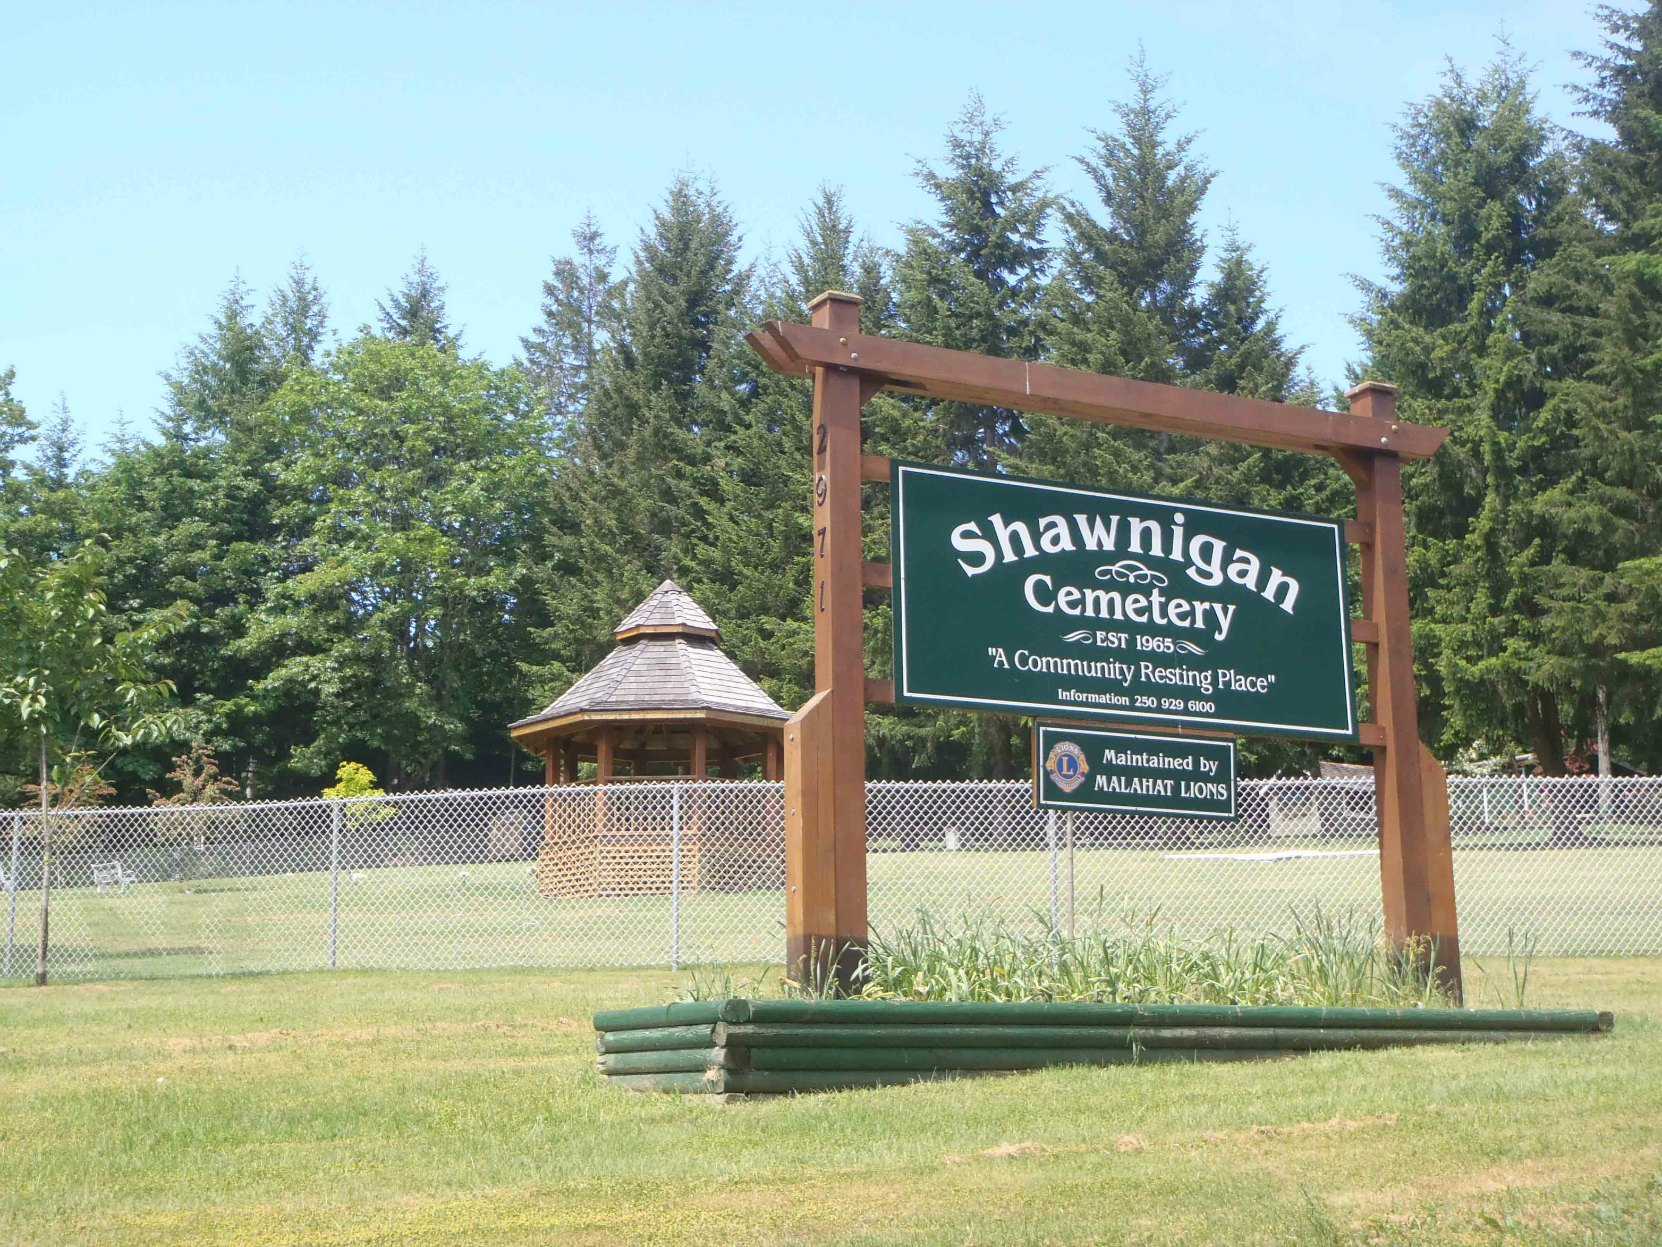 Shawnigan Cemetery, Shawnigan Lake, B.C. (photo by Temple Lodge No. 33 Historian)